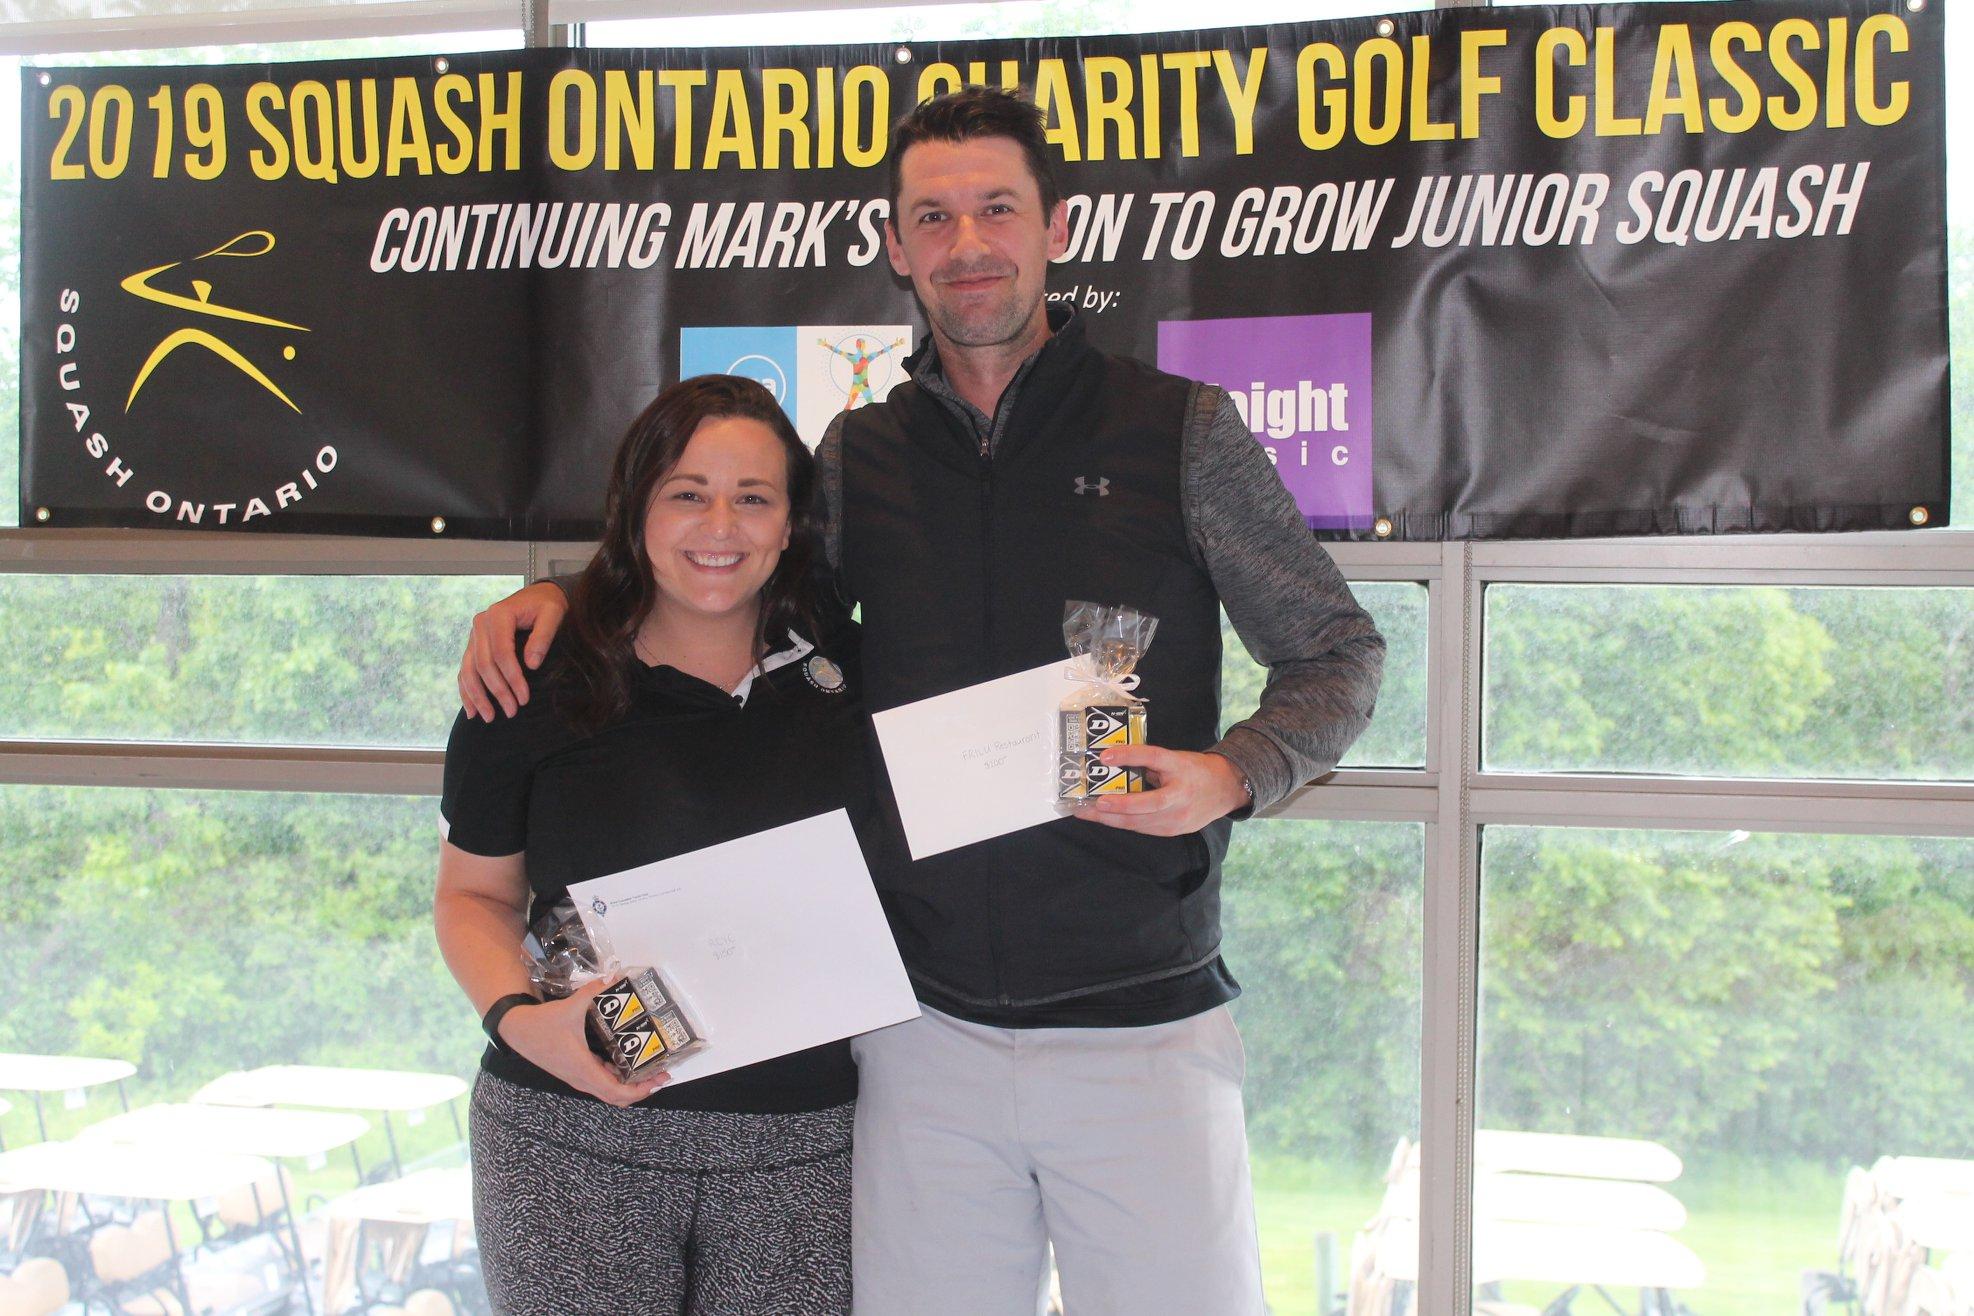 Longest Drive winners Lauren Sachvie and Scott Arnold